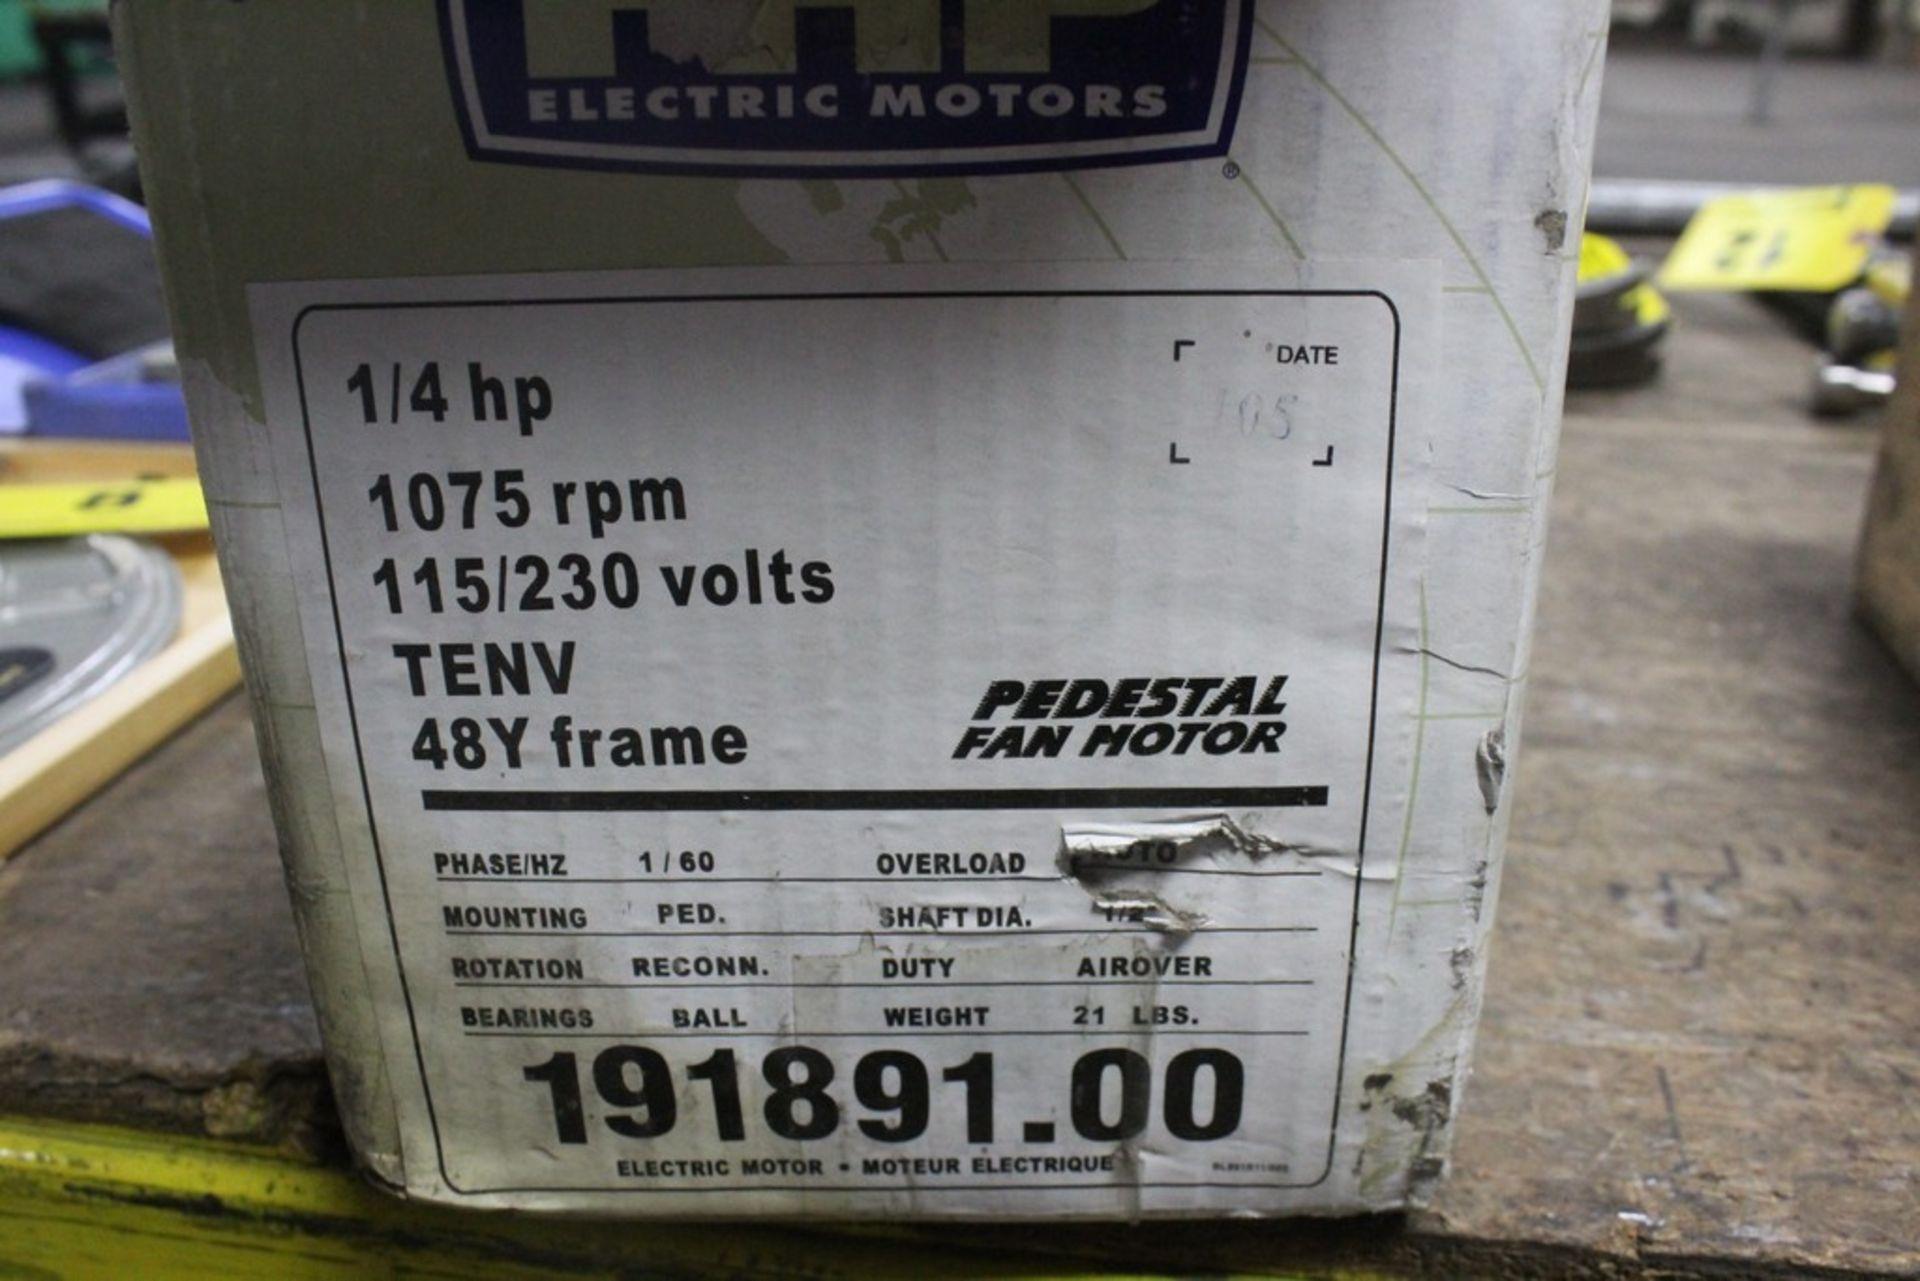 1/4 Hp 48Y Frame AC Motor - 115/230V - New in Box - Image 2 of 2